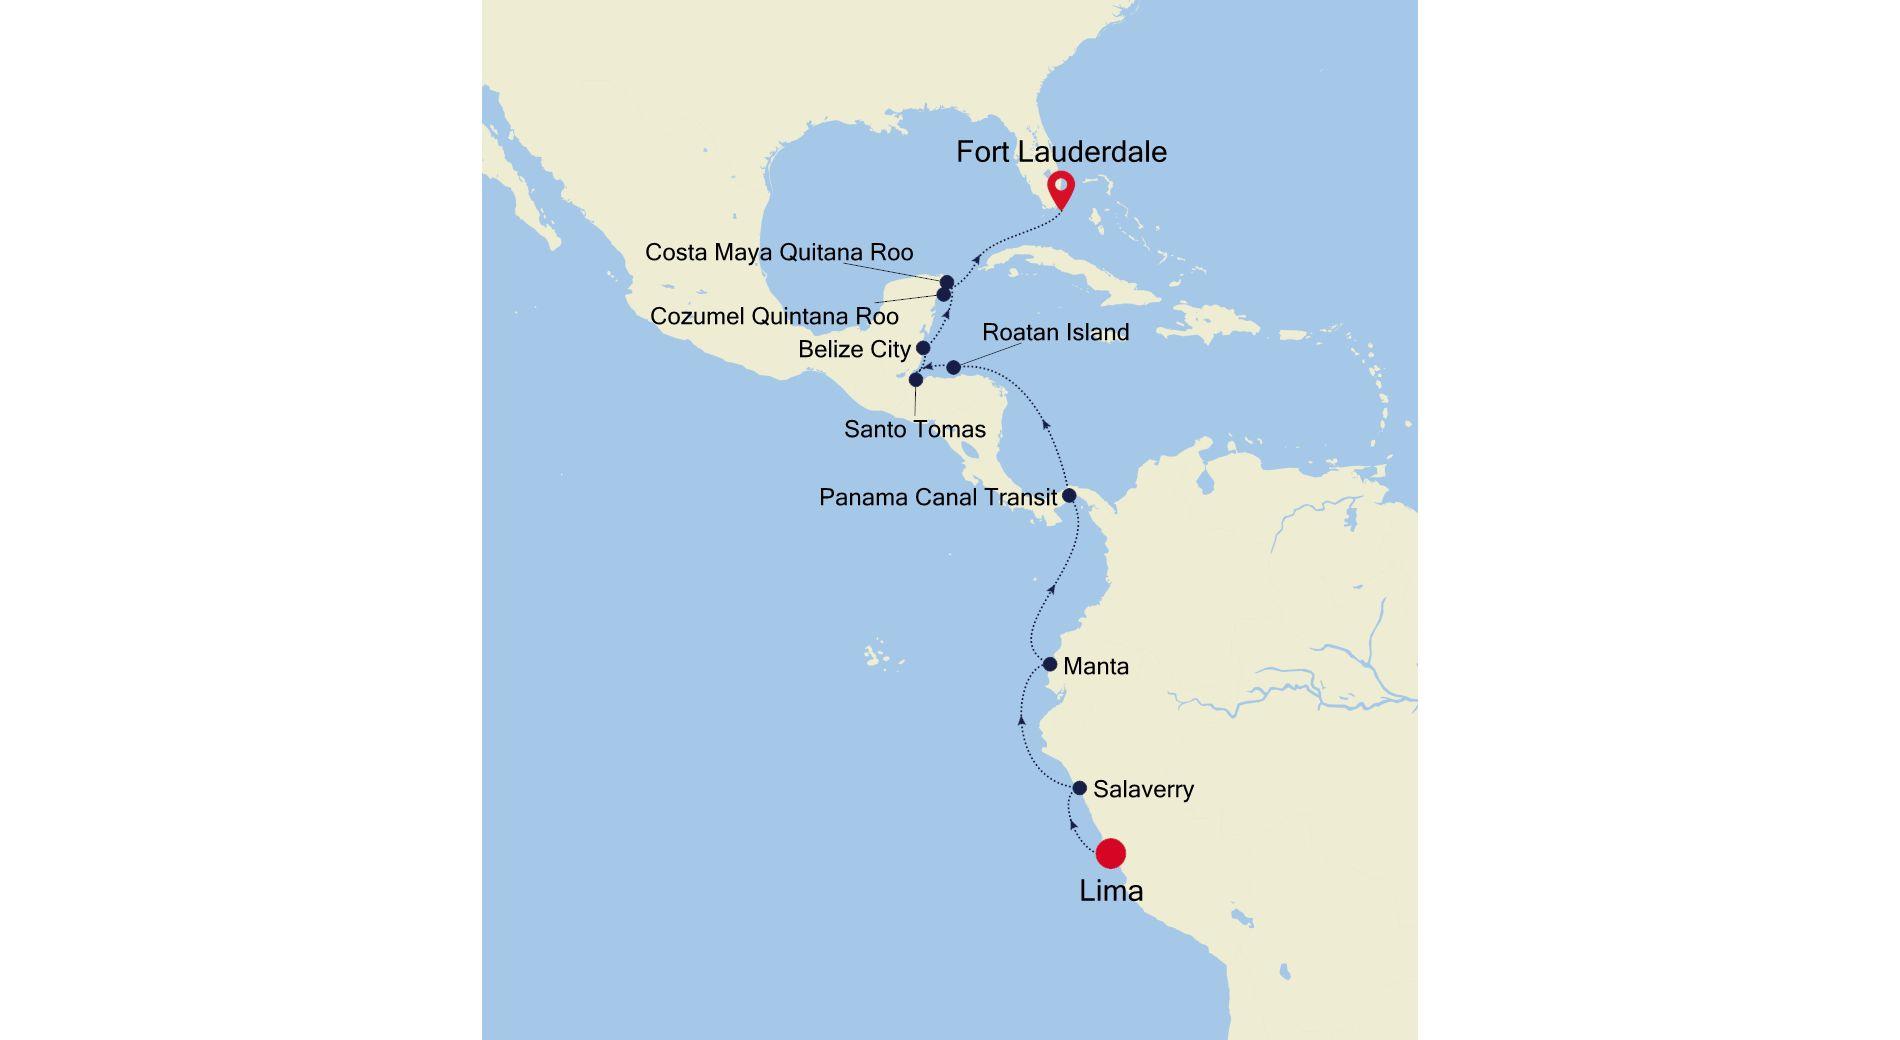 DA211218016 - Lima nach Fort Lauderdale